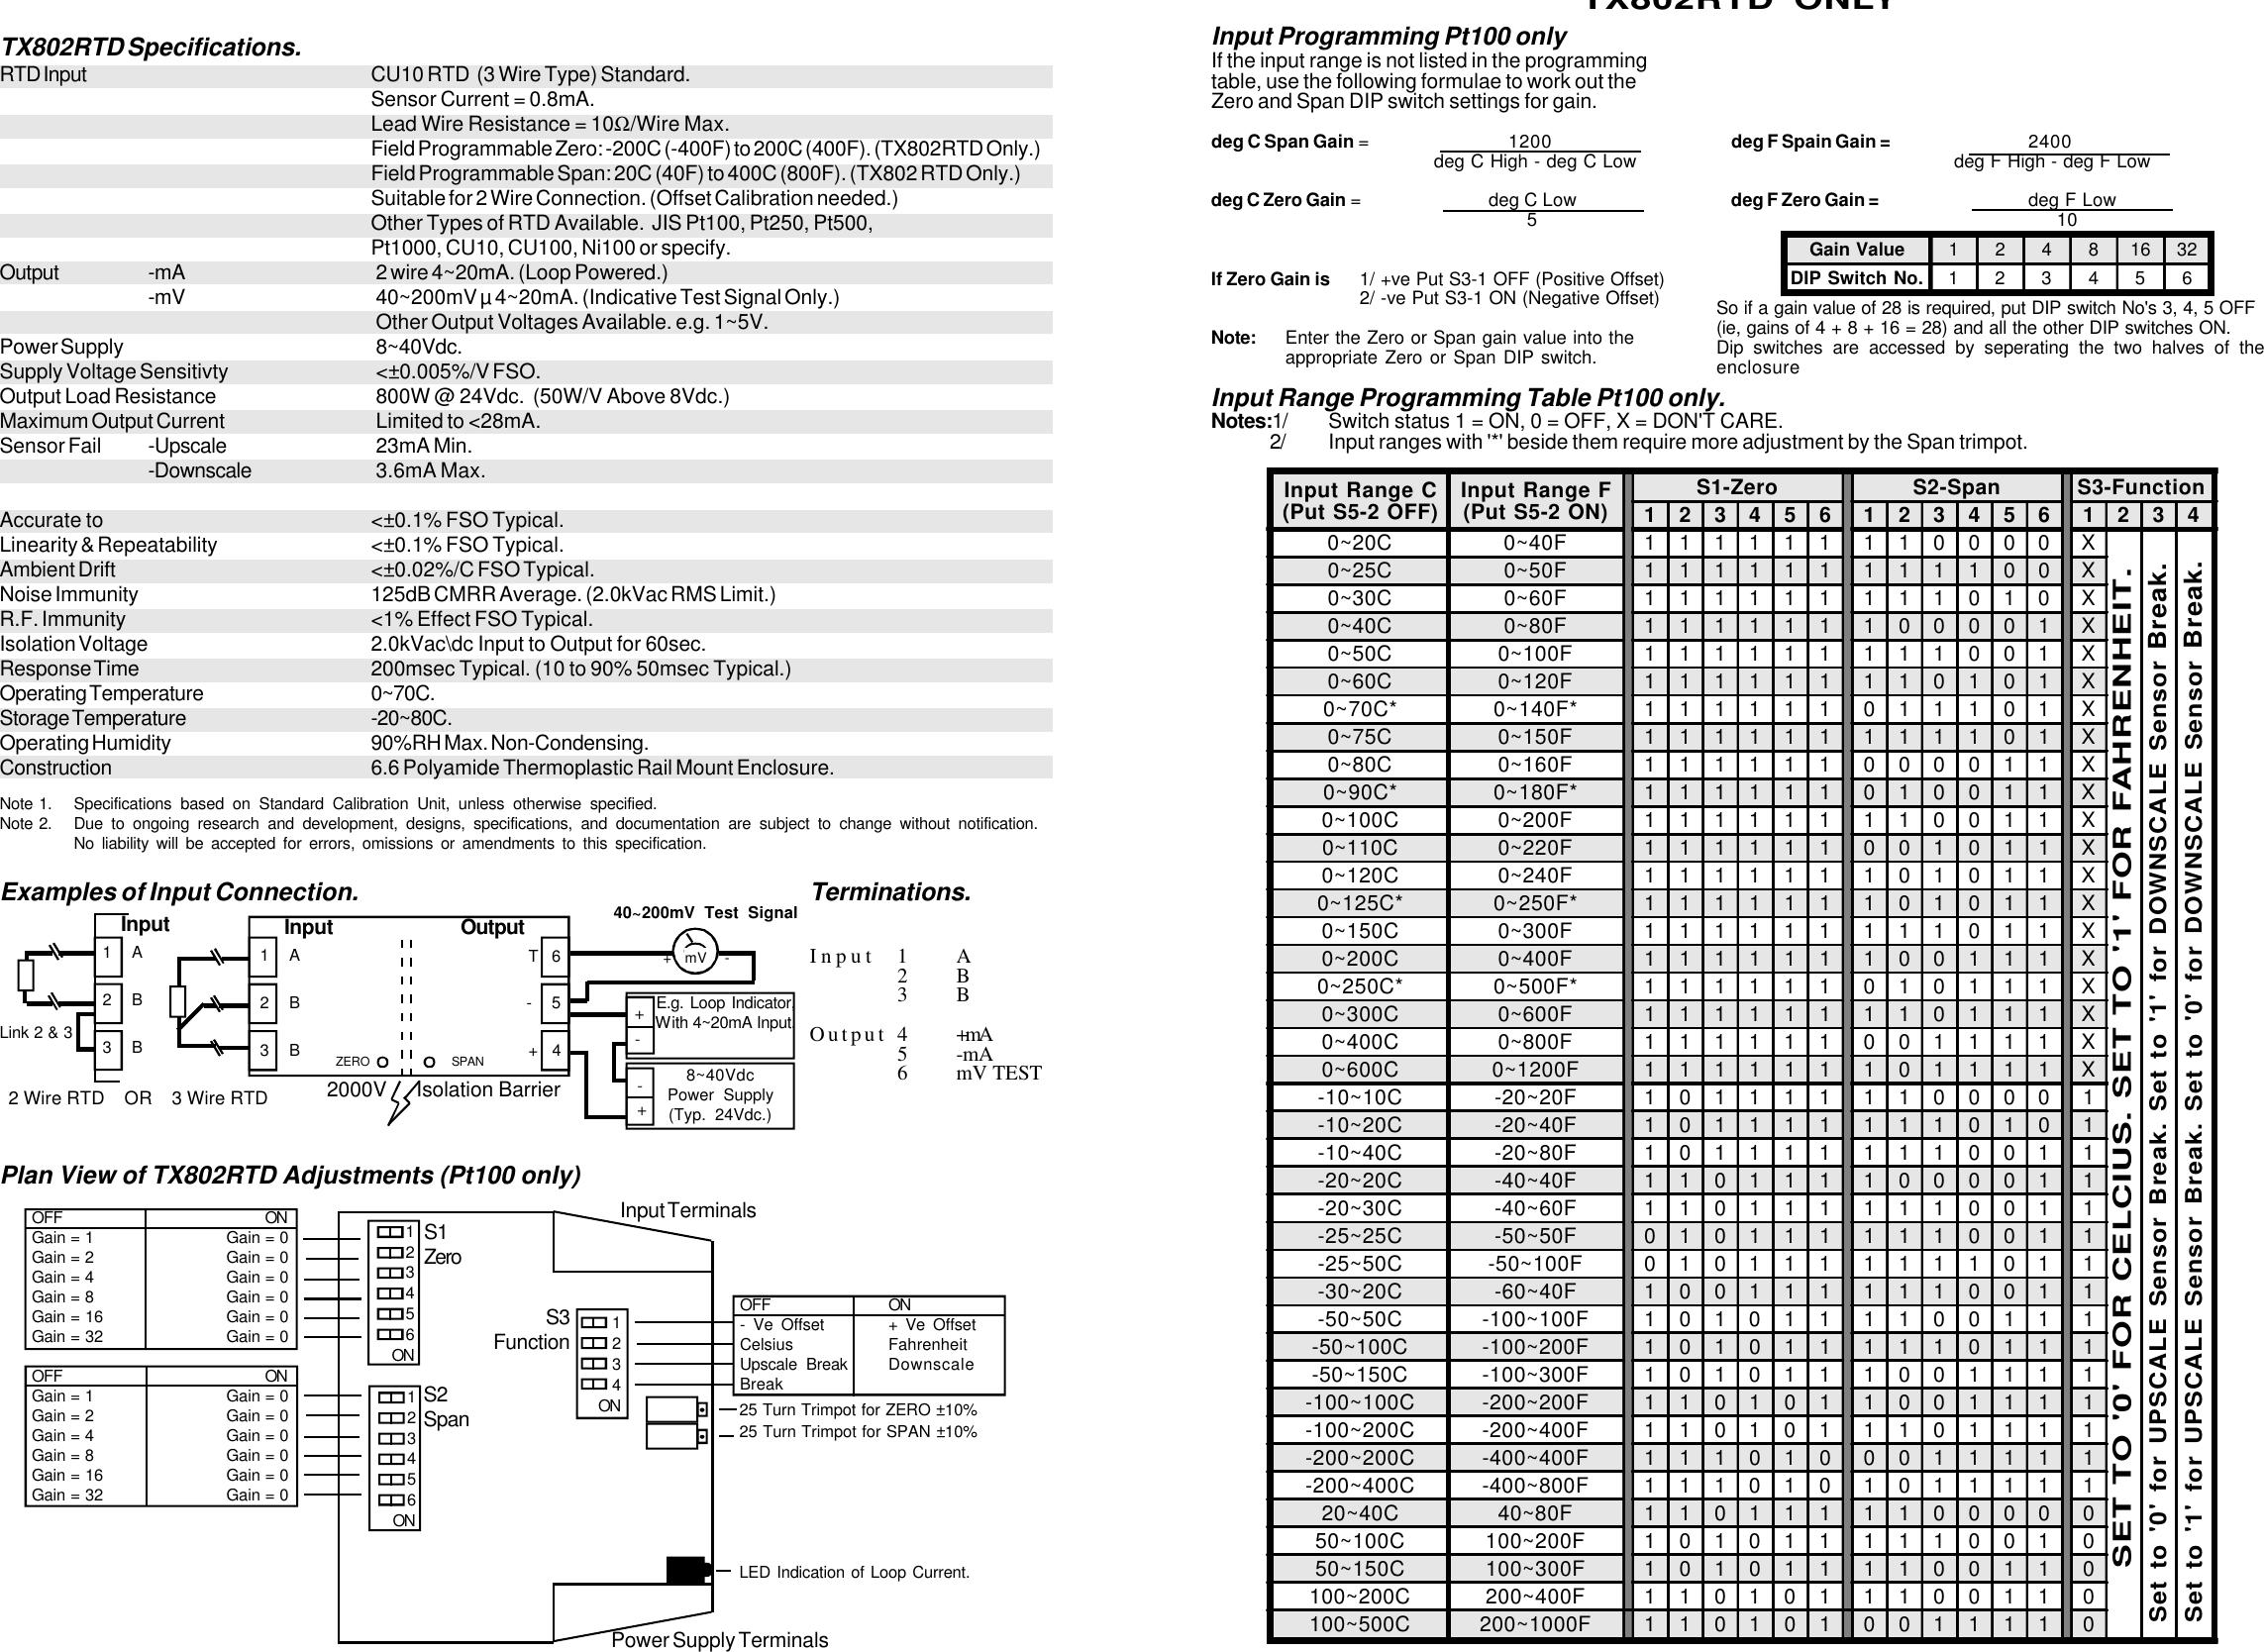 Fantastisch 2 Draht Temperatursensor Ideen - Schaltplan Serie ...